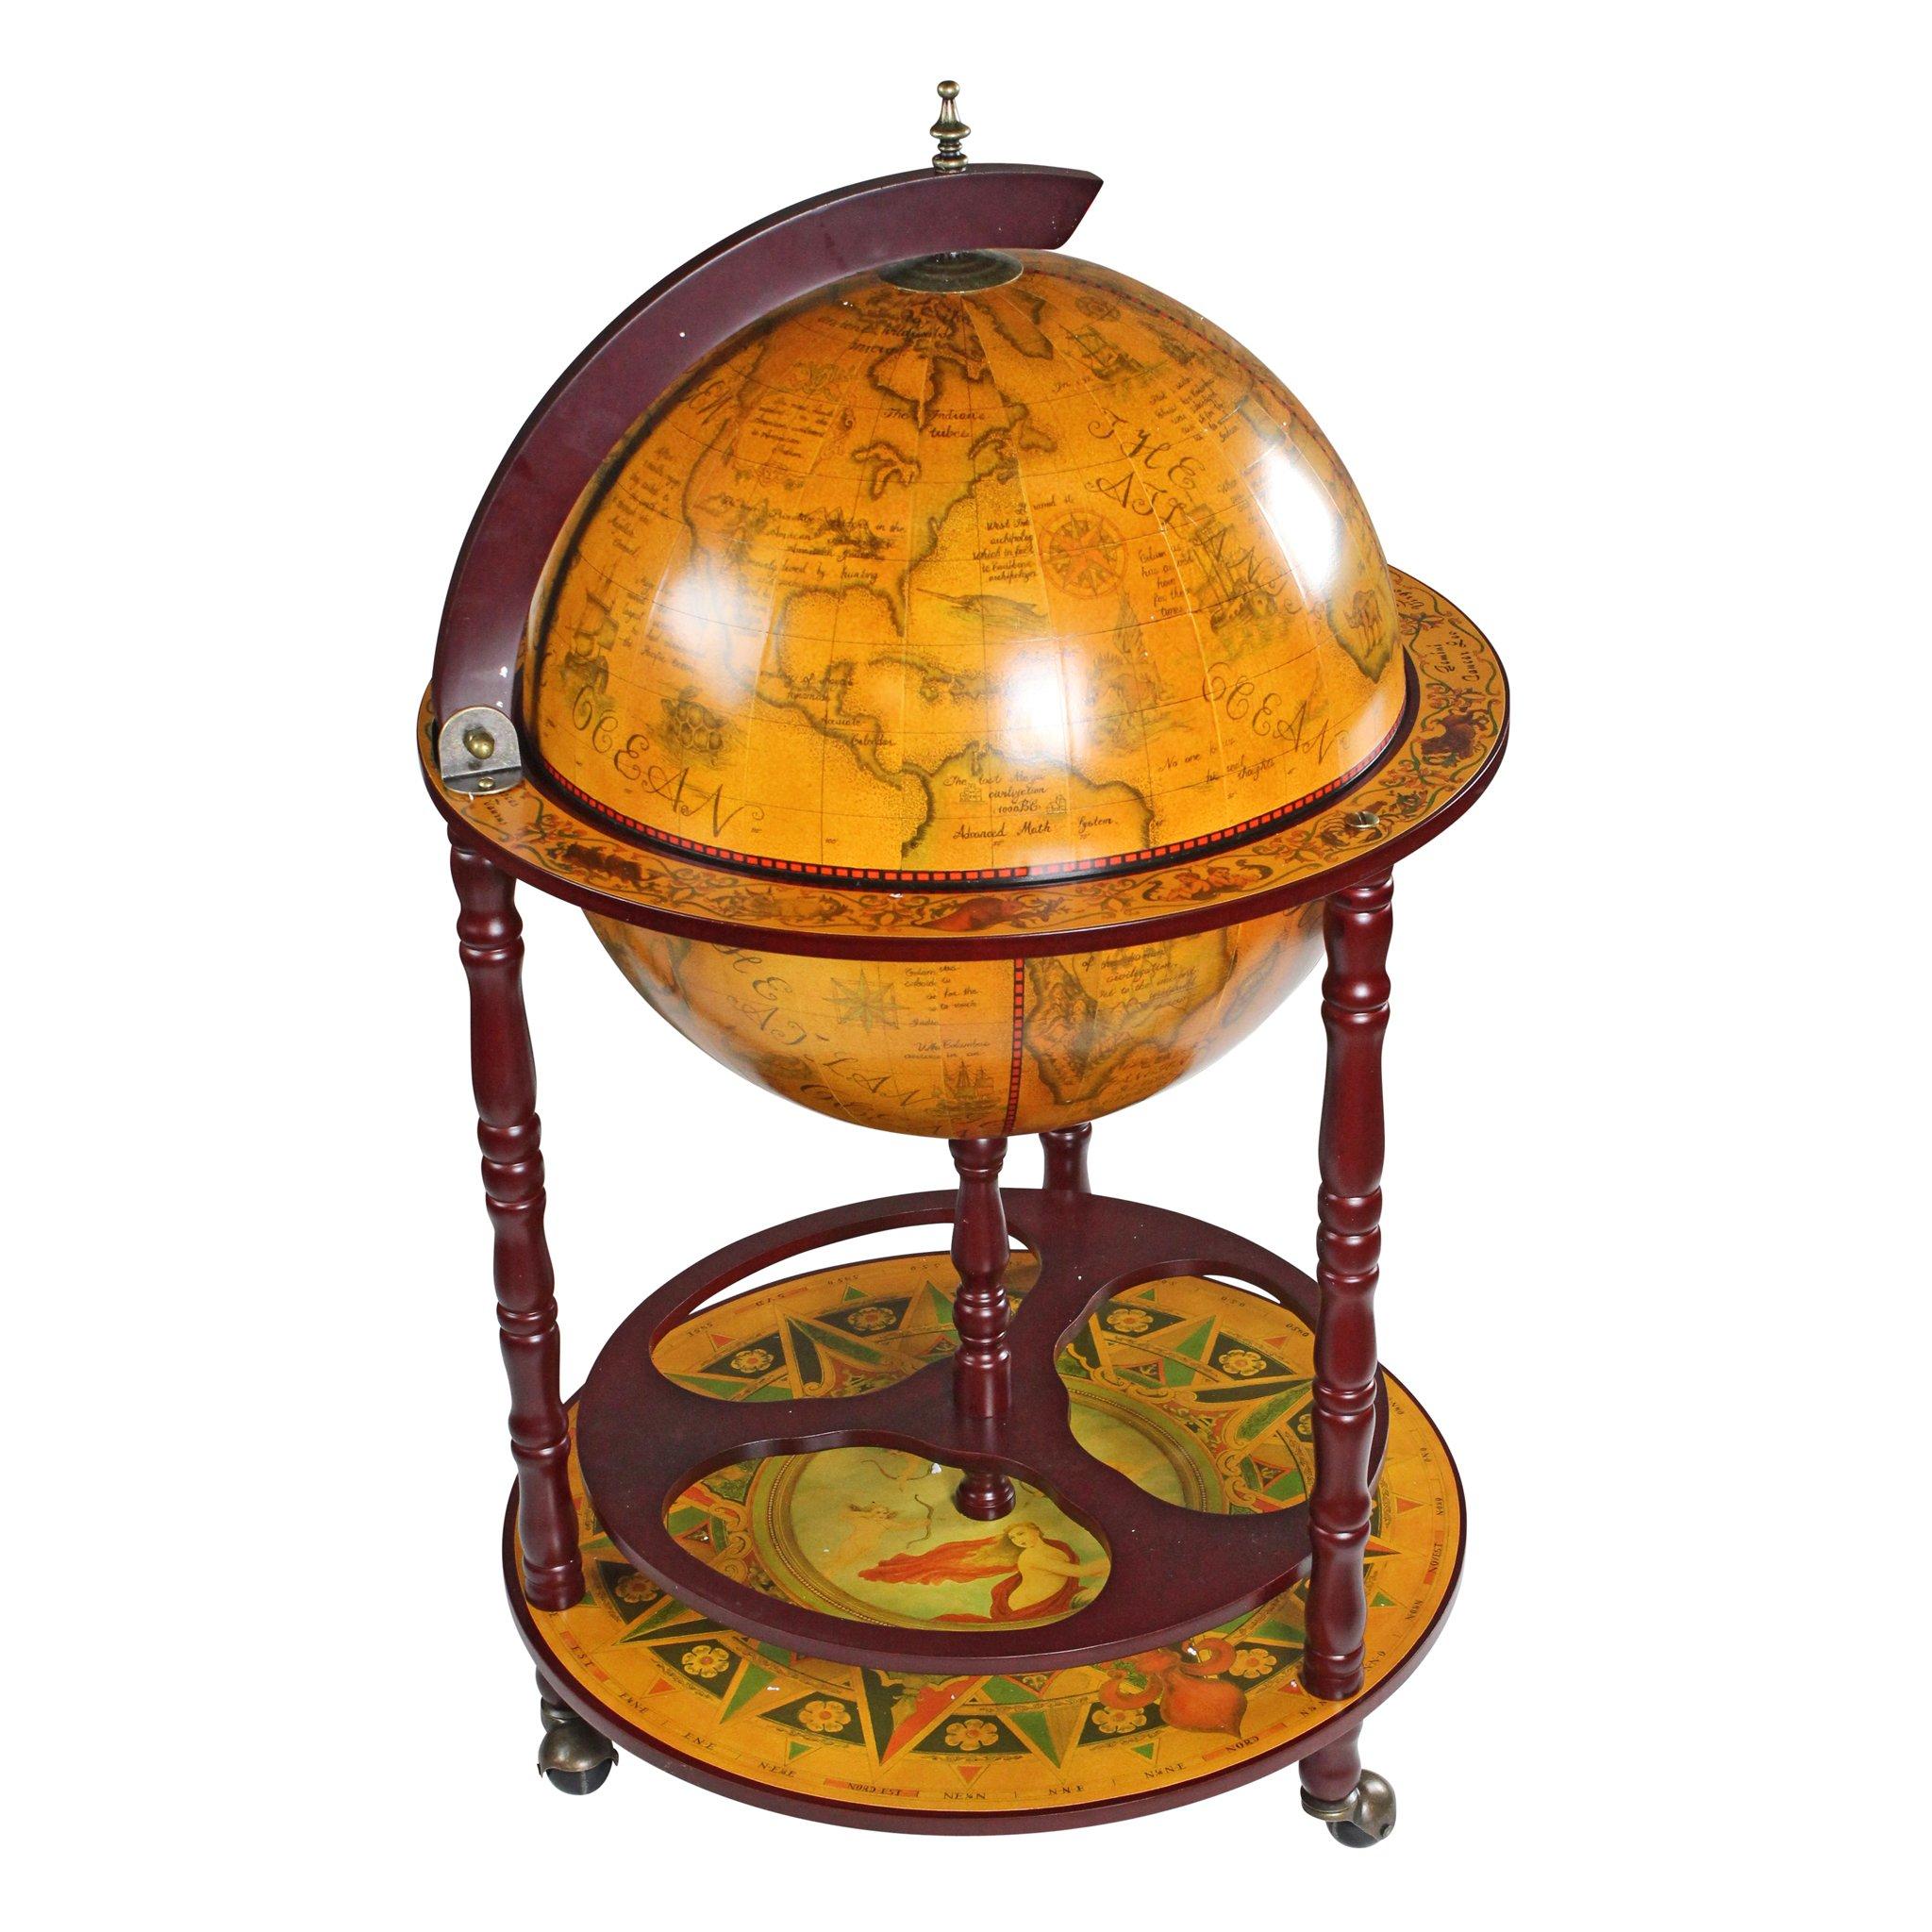 Liquor Cabinet - Sixteenth-Century Italian Replica Globe Bar Cart - Home Bar - Bar Cart on Wheels